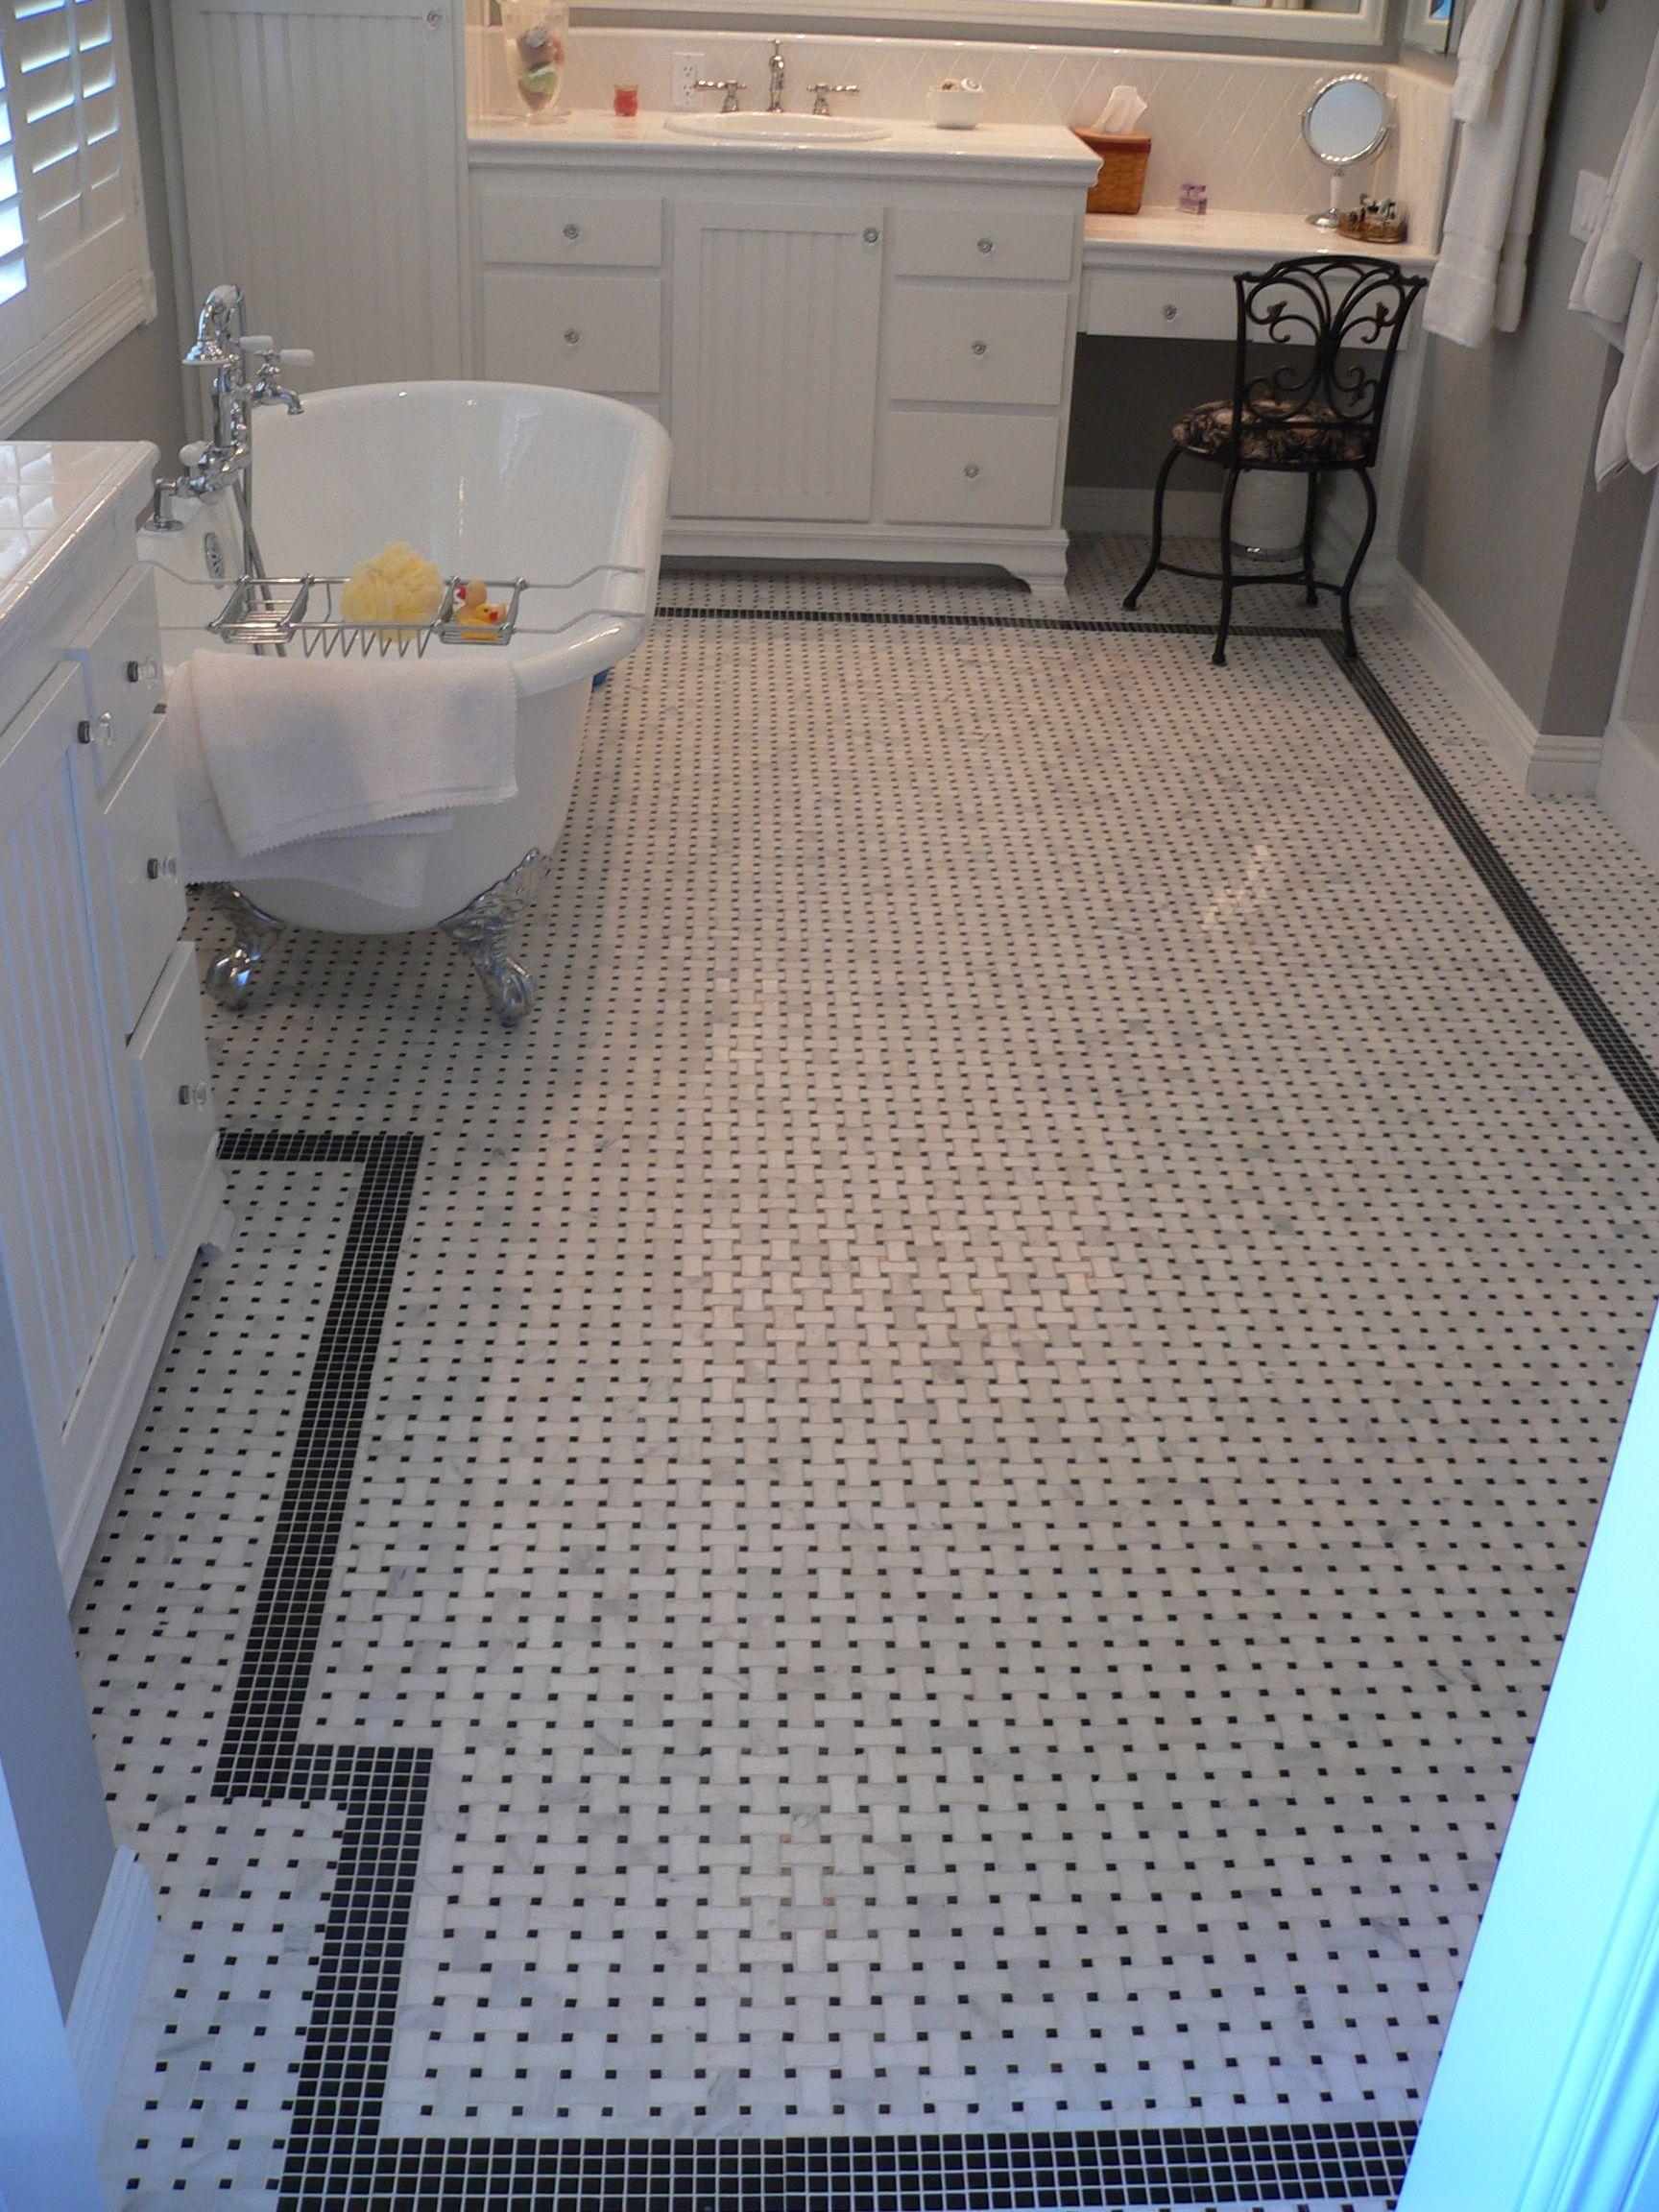 coupons floor for bathroom cope vintage ideas patterns sofa and rherinslenscom gorgeous classic tile trends rhbeanleafcom idea flooring decor